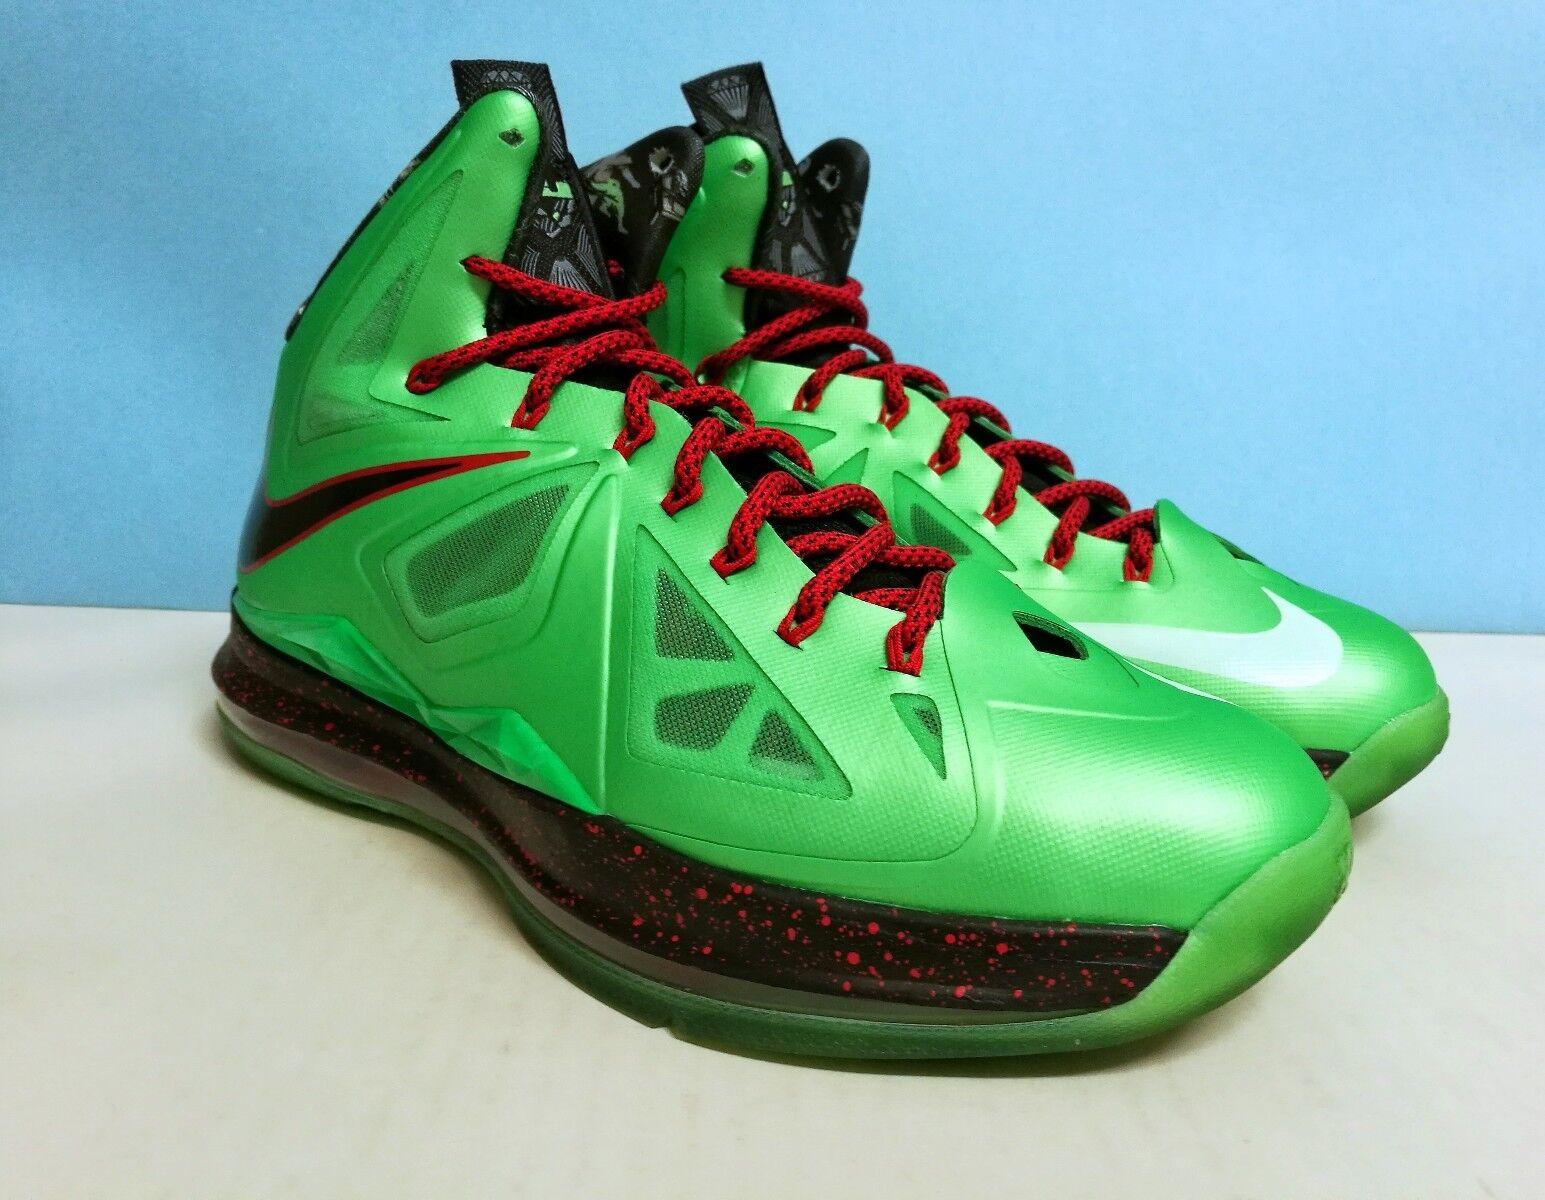 timeless design 6e4a9 561d3 Nike Lebron X CUTTIN JADE sz 9 US 42.5 EU 541100 303 Jordan kobe kd